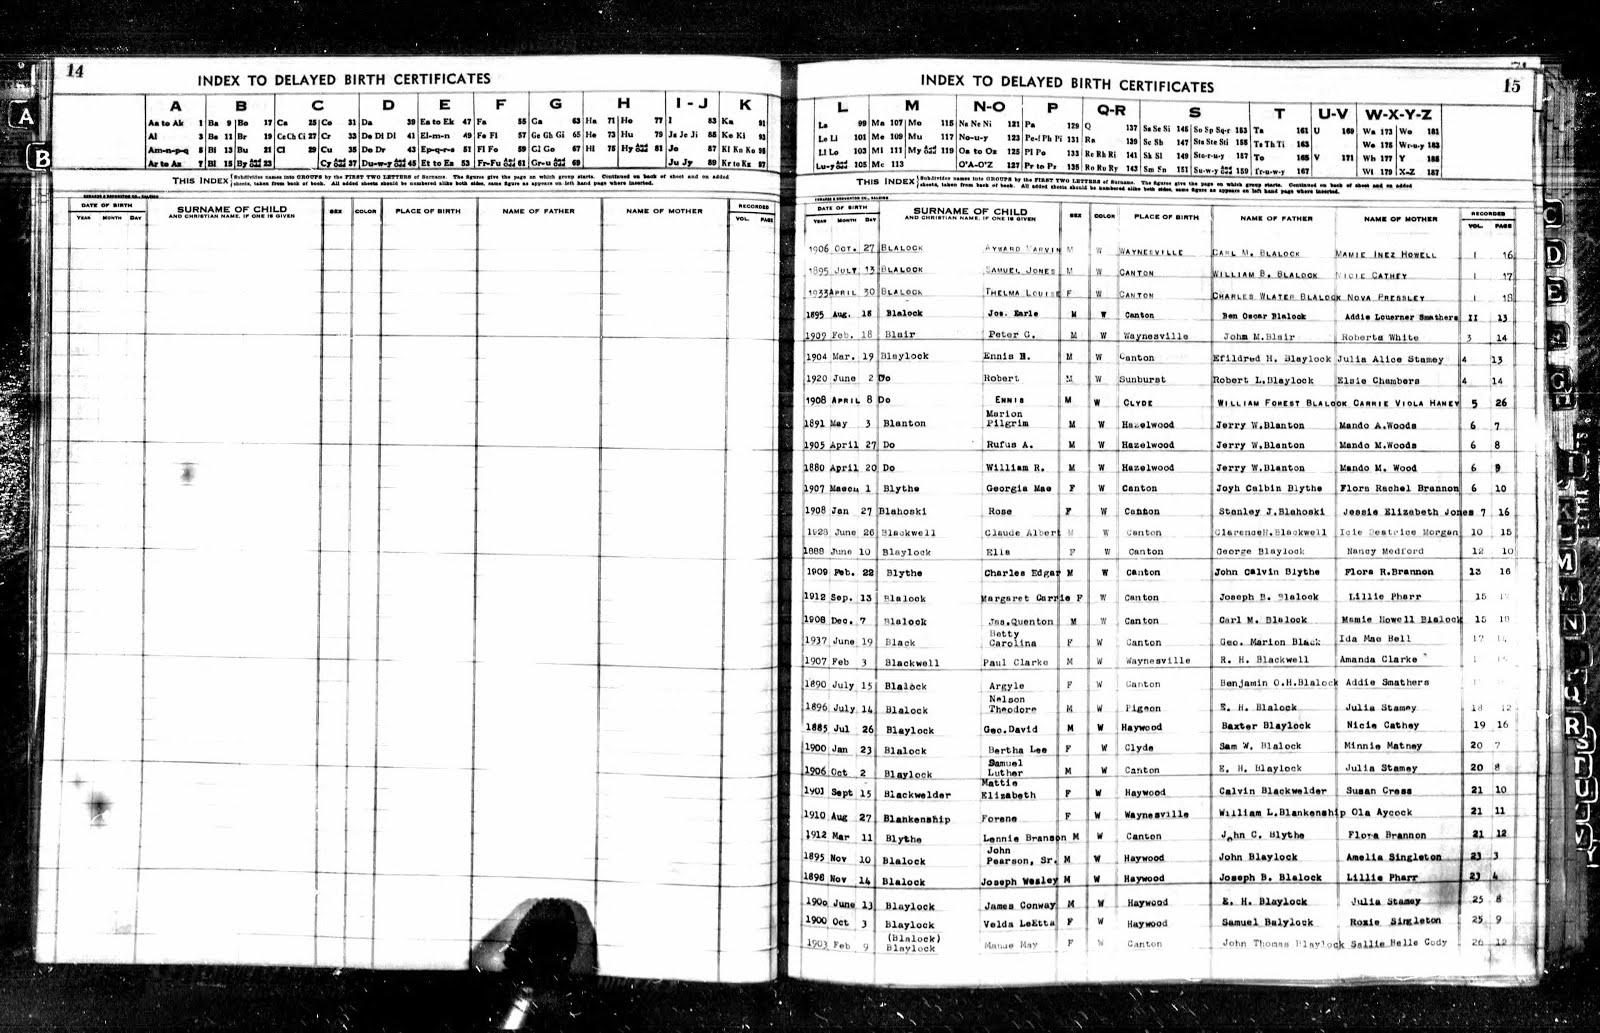 Dred blalock family history etheldred hester blalock 1869 1941 north carolina birth index 1800 2000 xflitez Gallery